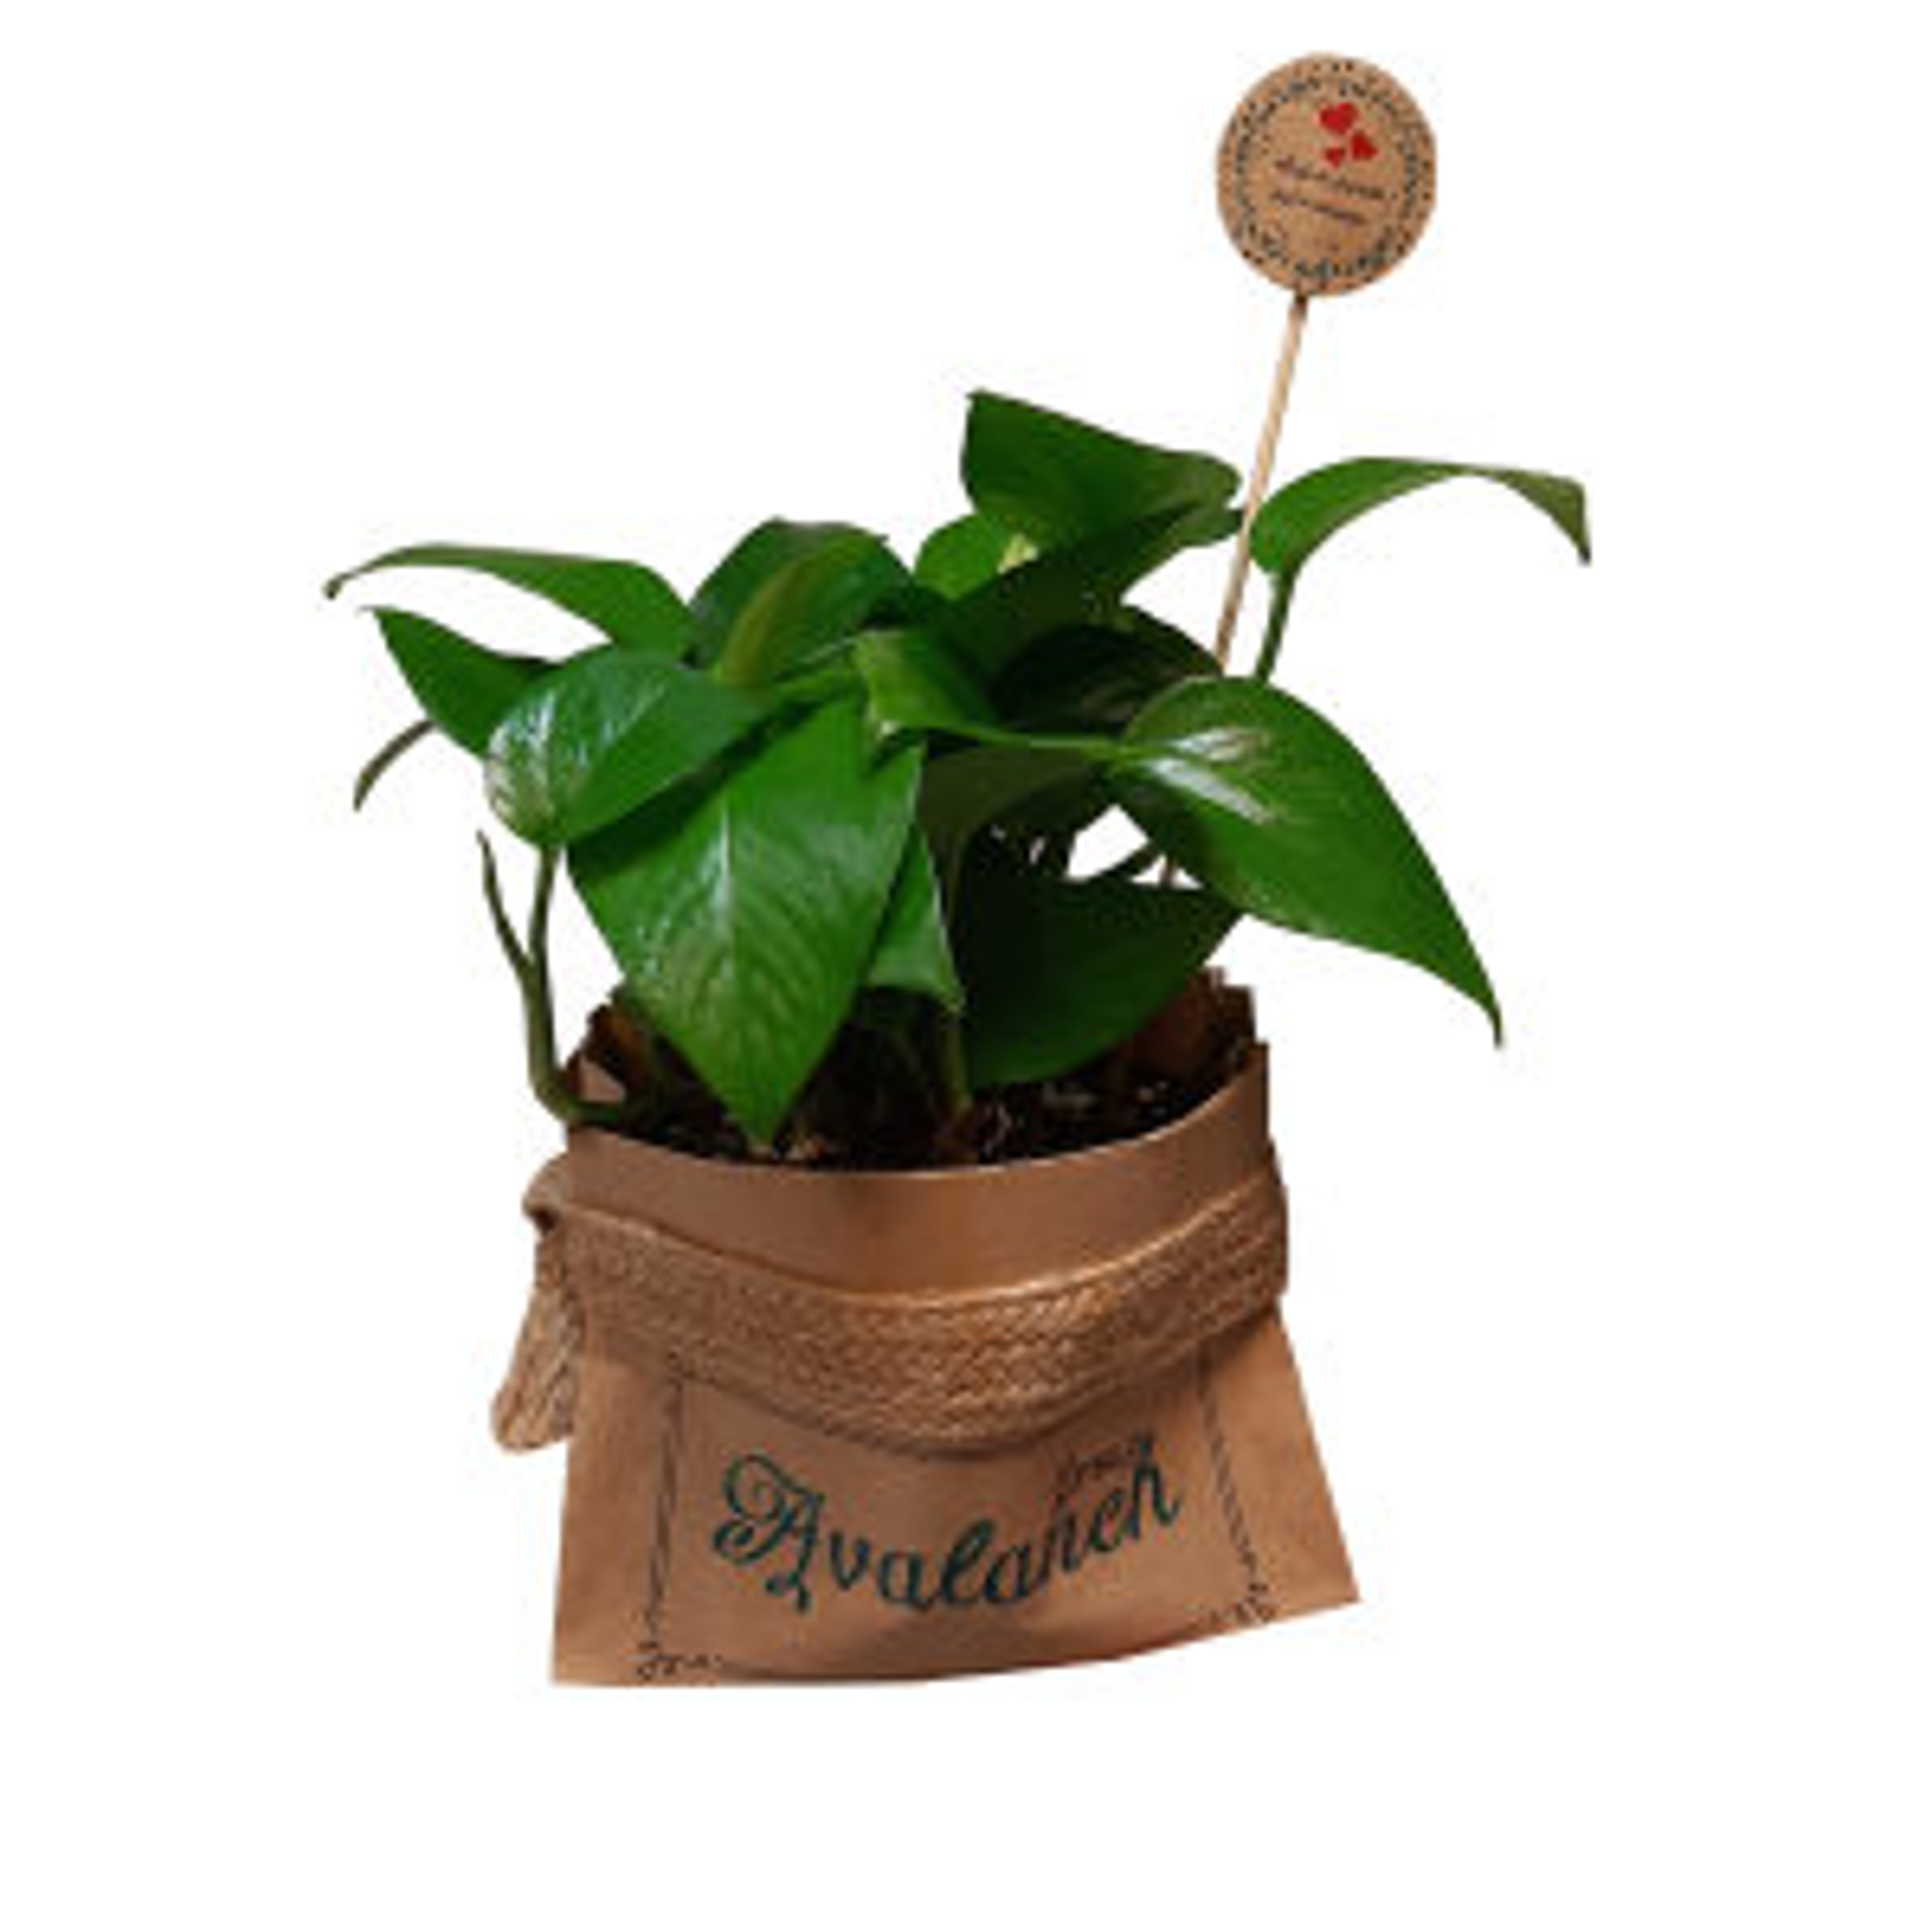 گیاه طبیعی پوتوس کدA.P.01